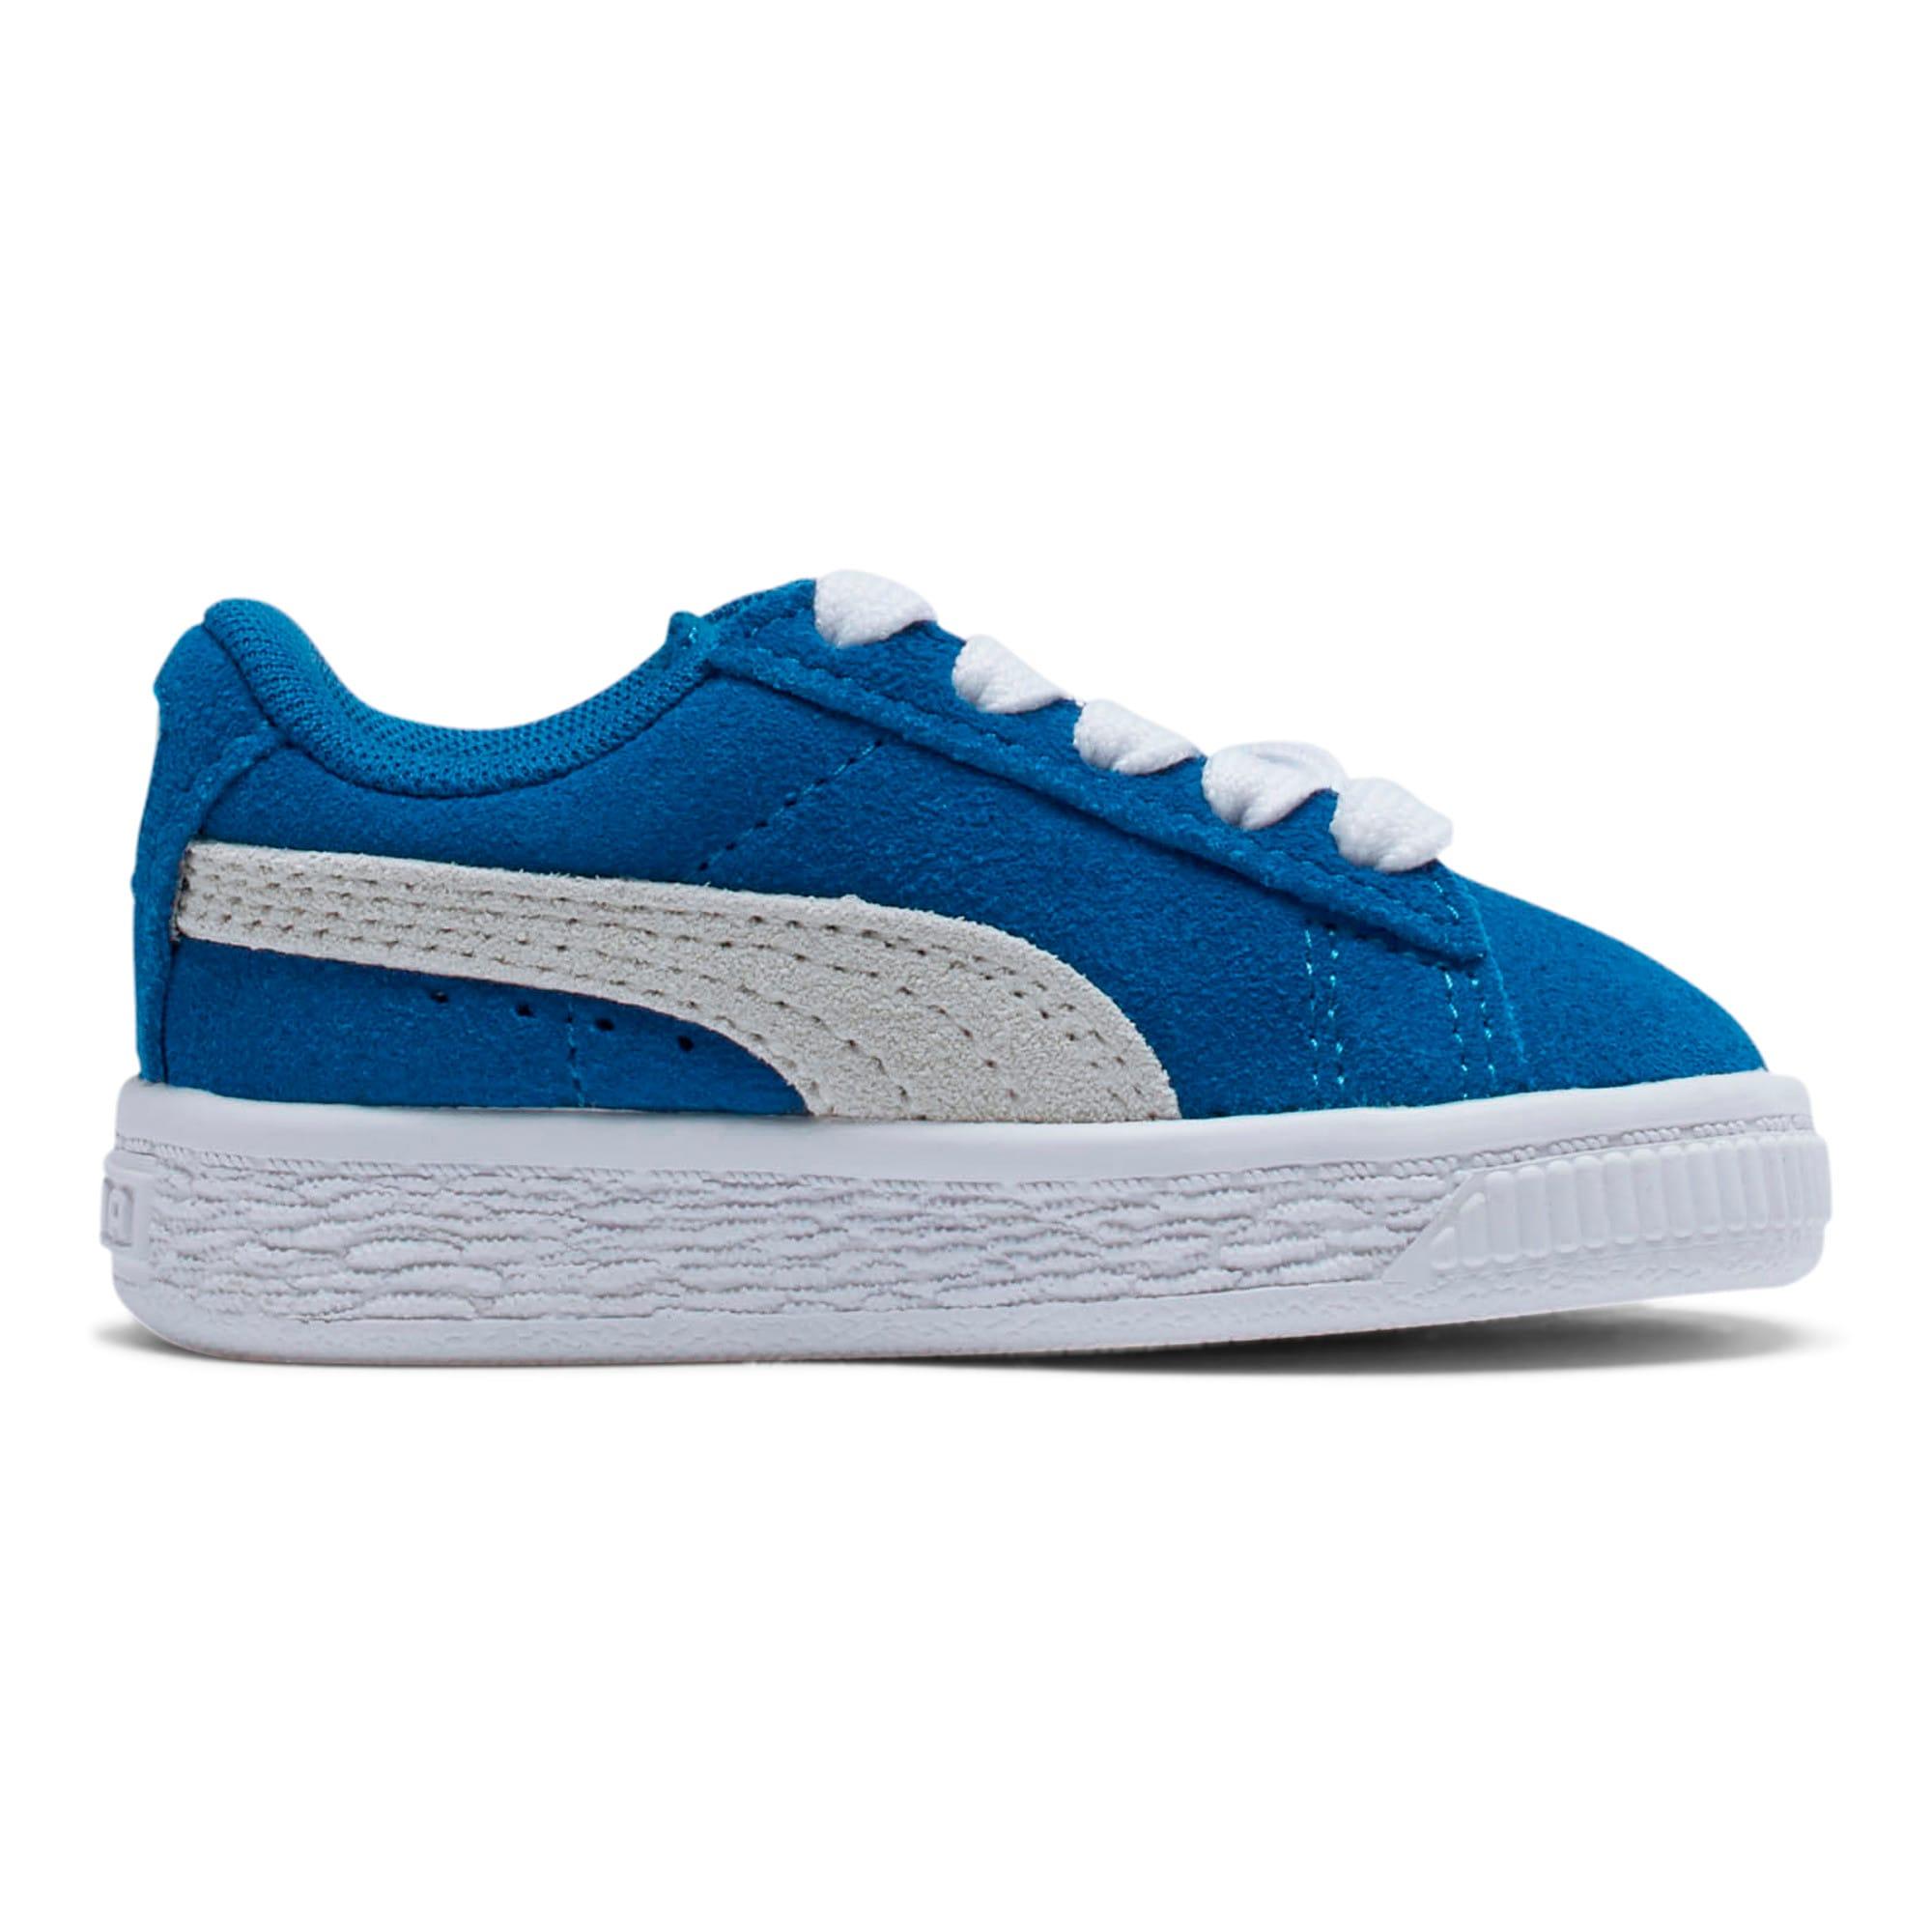 Thumbnail 5 of Puma Suede Toddler Shoes, Snorkel Blue-Puma White, medium